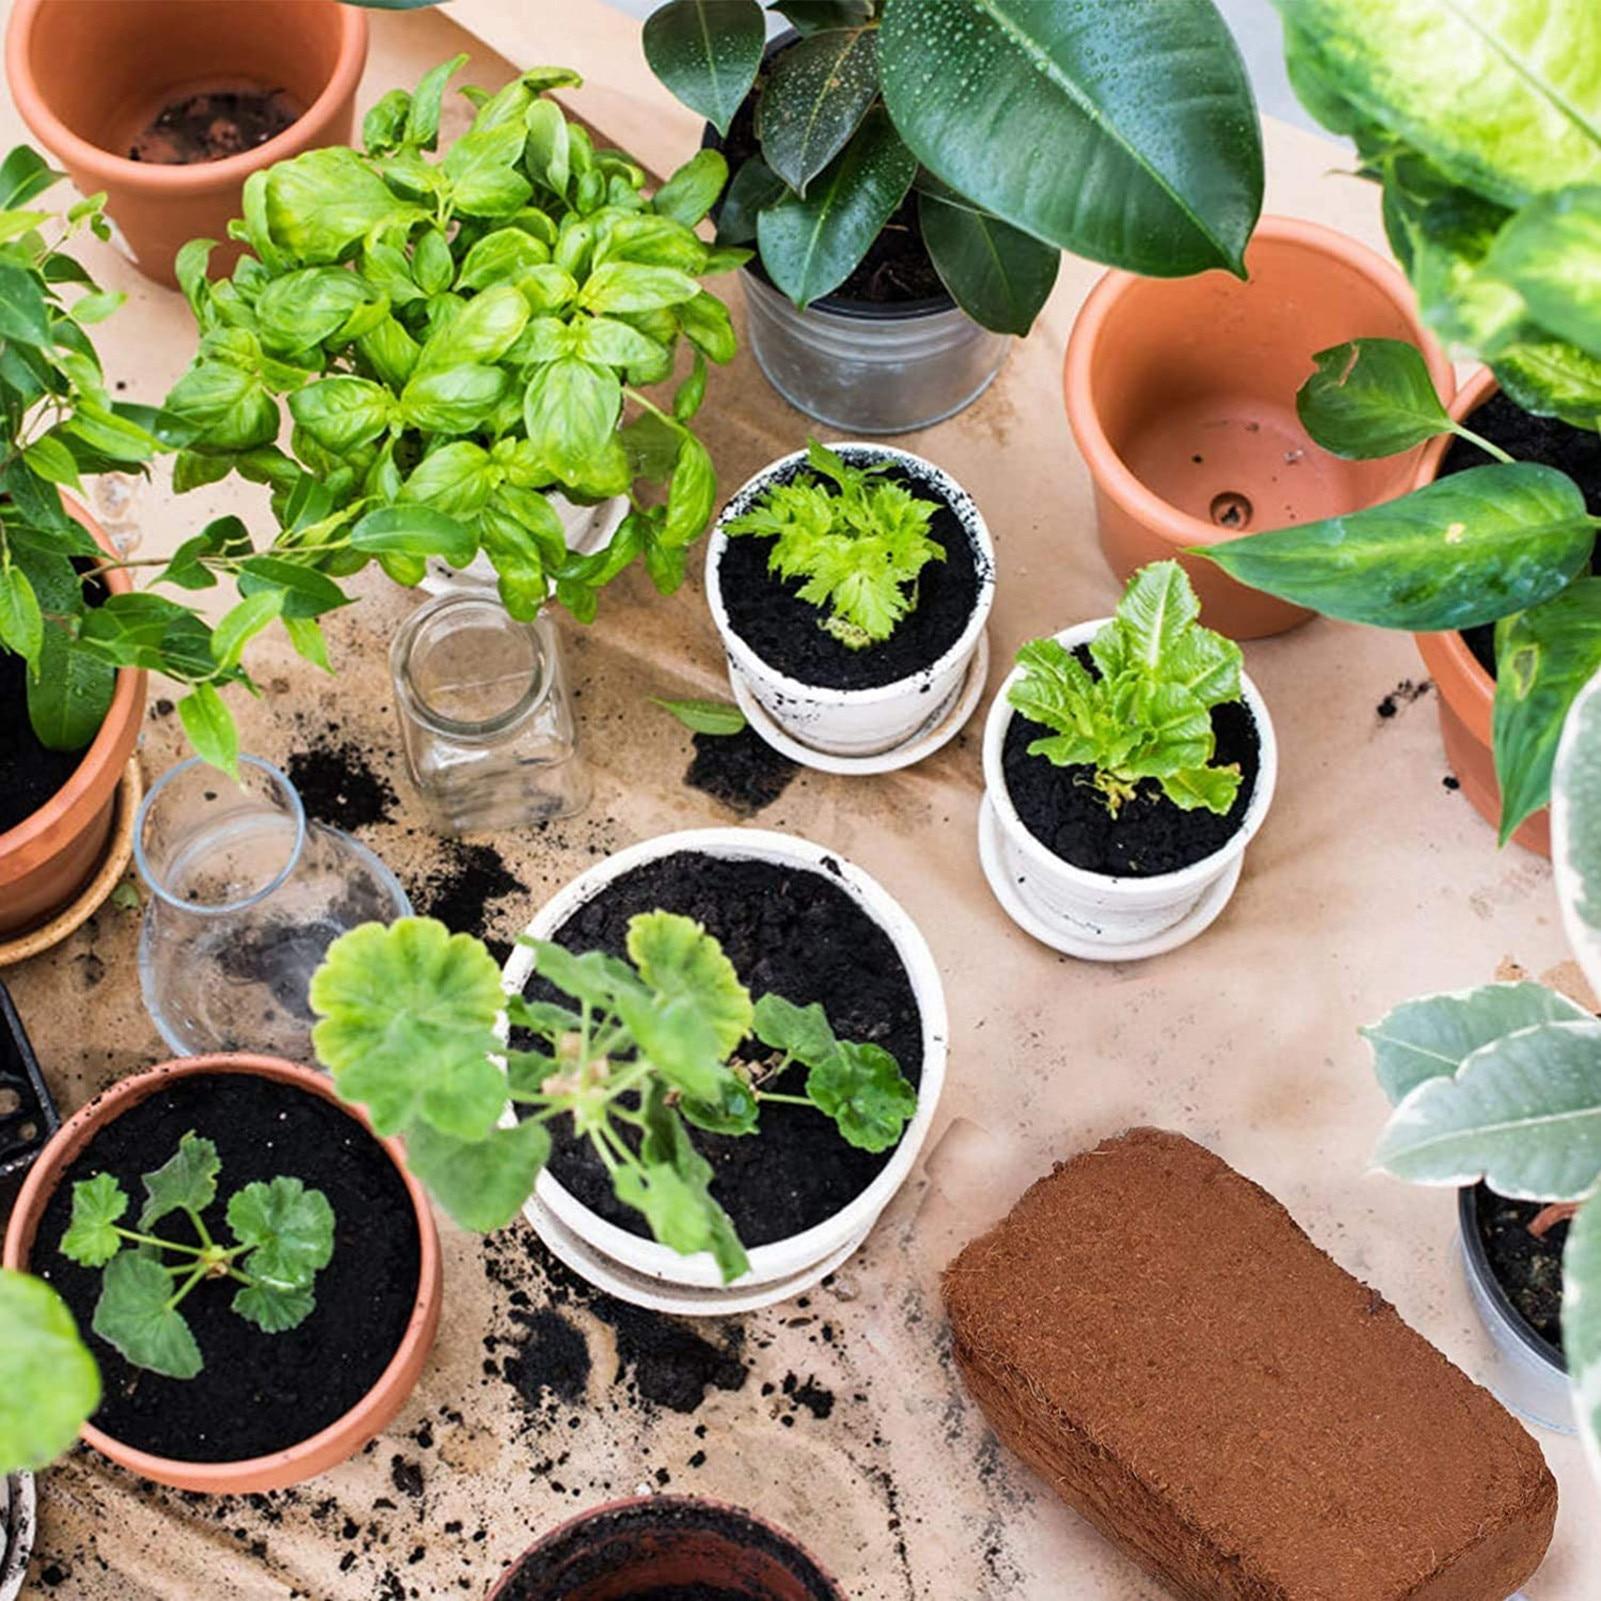 1.4 Pounds Coconut Coir Brick Peat Growing Organic Soilless Potting Garden Natural Plants Soil Nutrient Bed